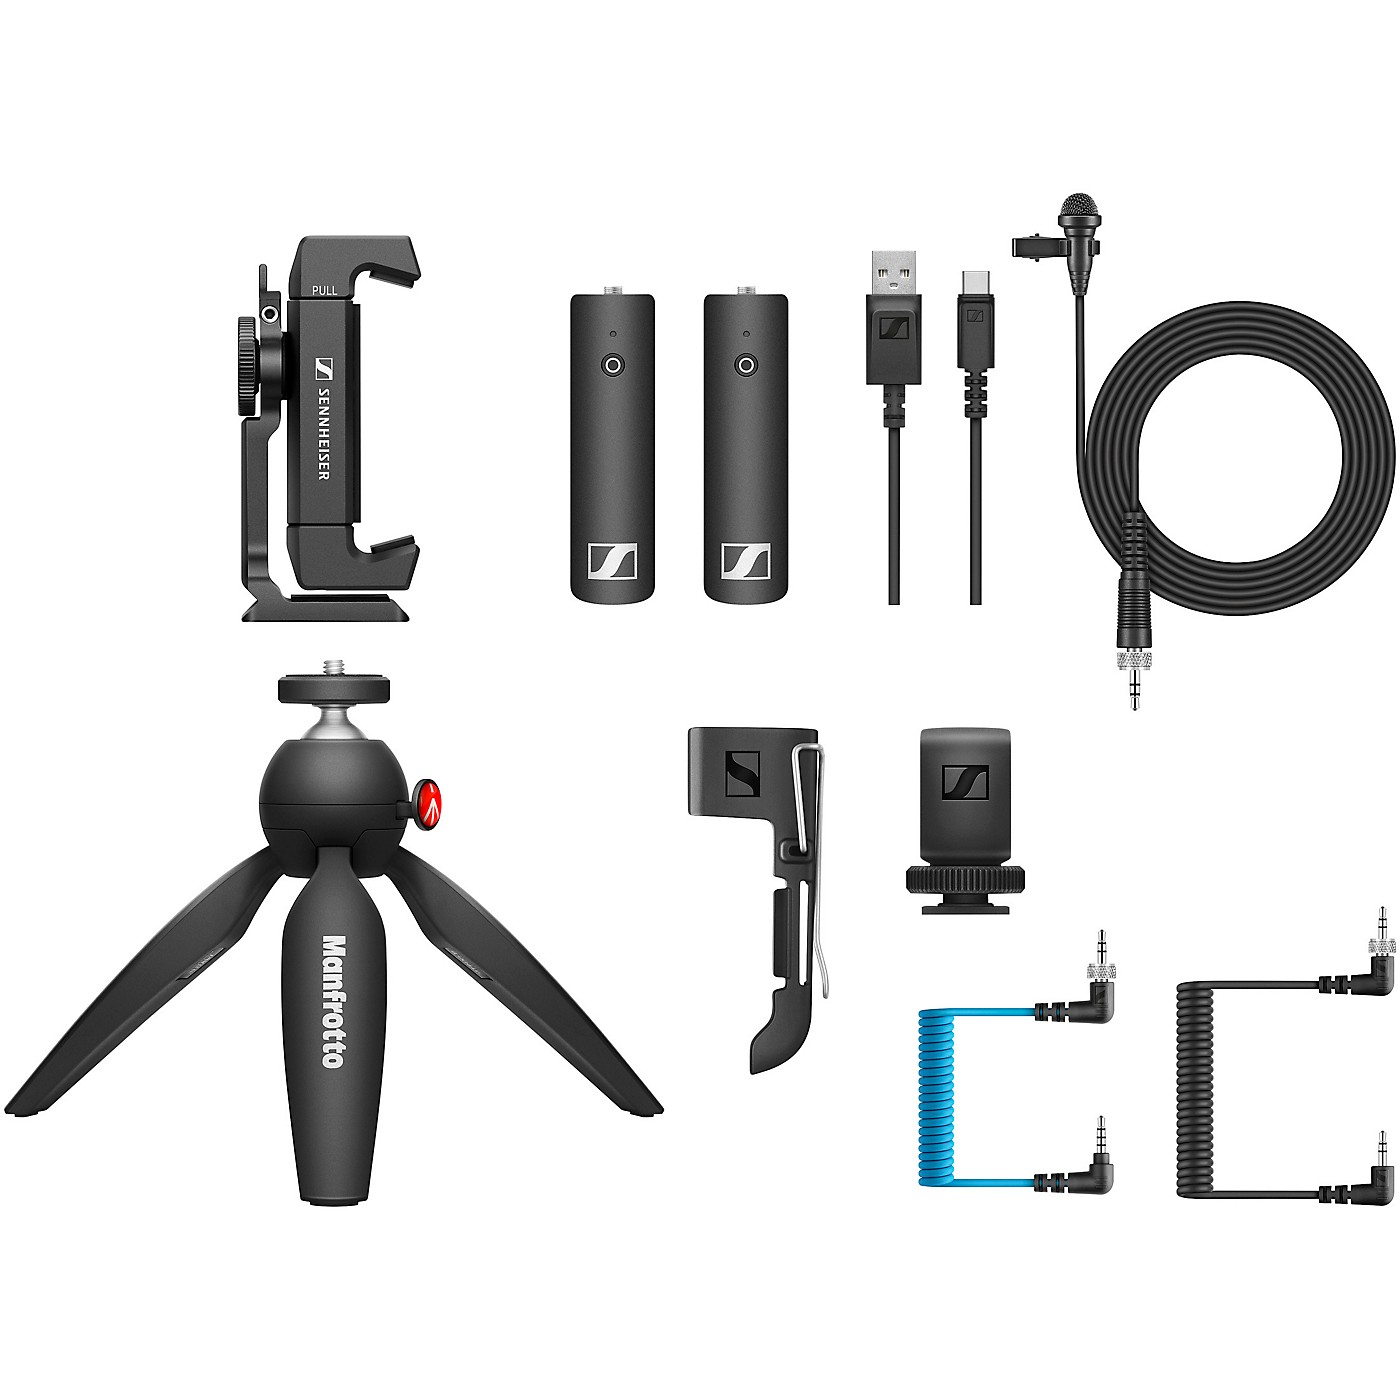 Sennheiser XSW-D PORTABLE LAV MOBILE KIT - Includes XSW-D Portable Lavalier Set, Manfrotto PIXI Mini Tripod and Sennheiser Smartphone Clamp thumbnail